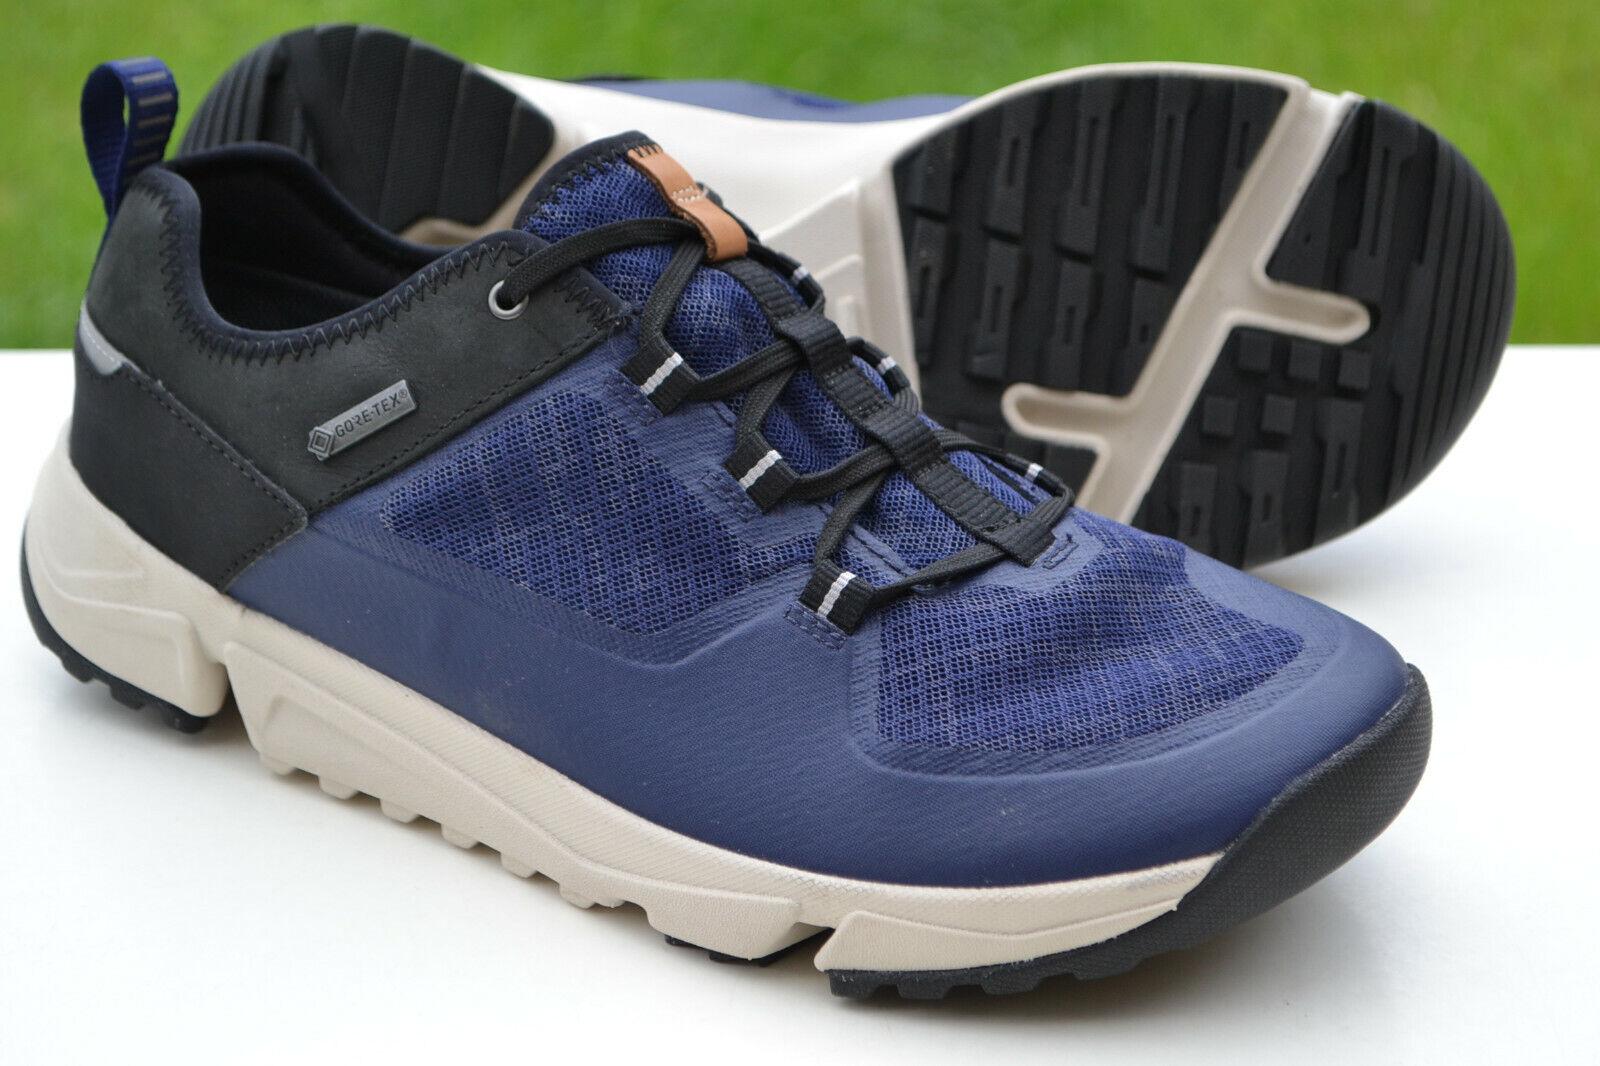 Clarks Mens Sporty Trigenic Shoes TRI TRACK RUN GTX Navy Combi UK 10 / 44.5